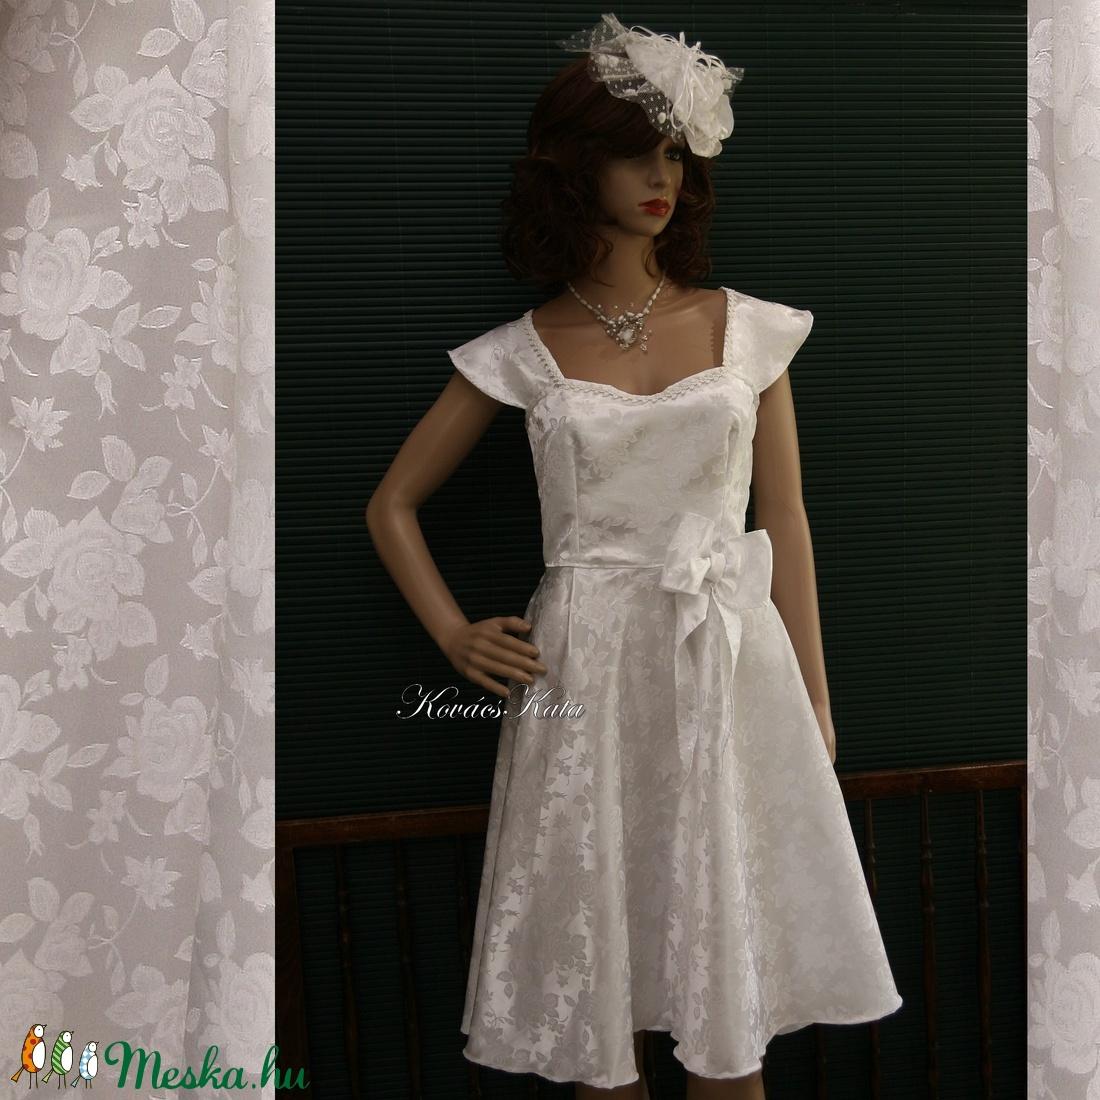 PIN-UP - brokát menyasszonyi ruha (Aranybrokat) - Meska.hu b6fb1180f7